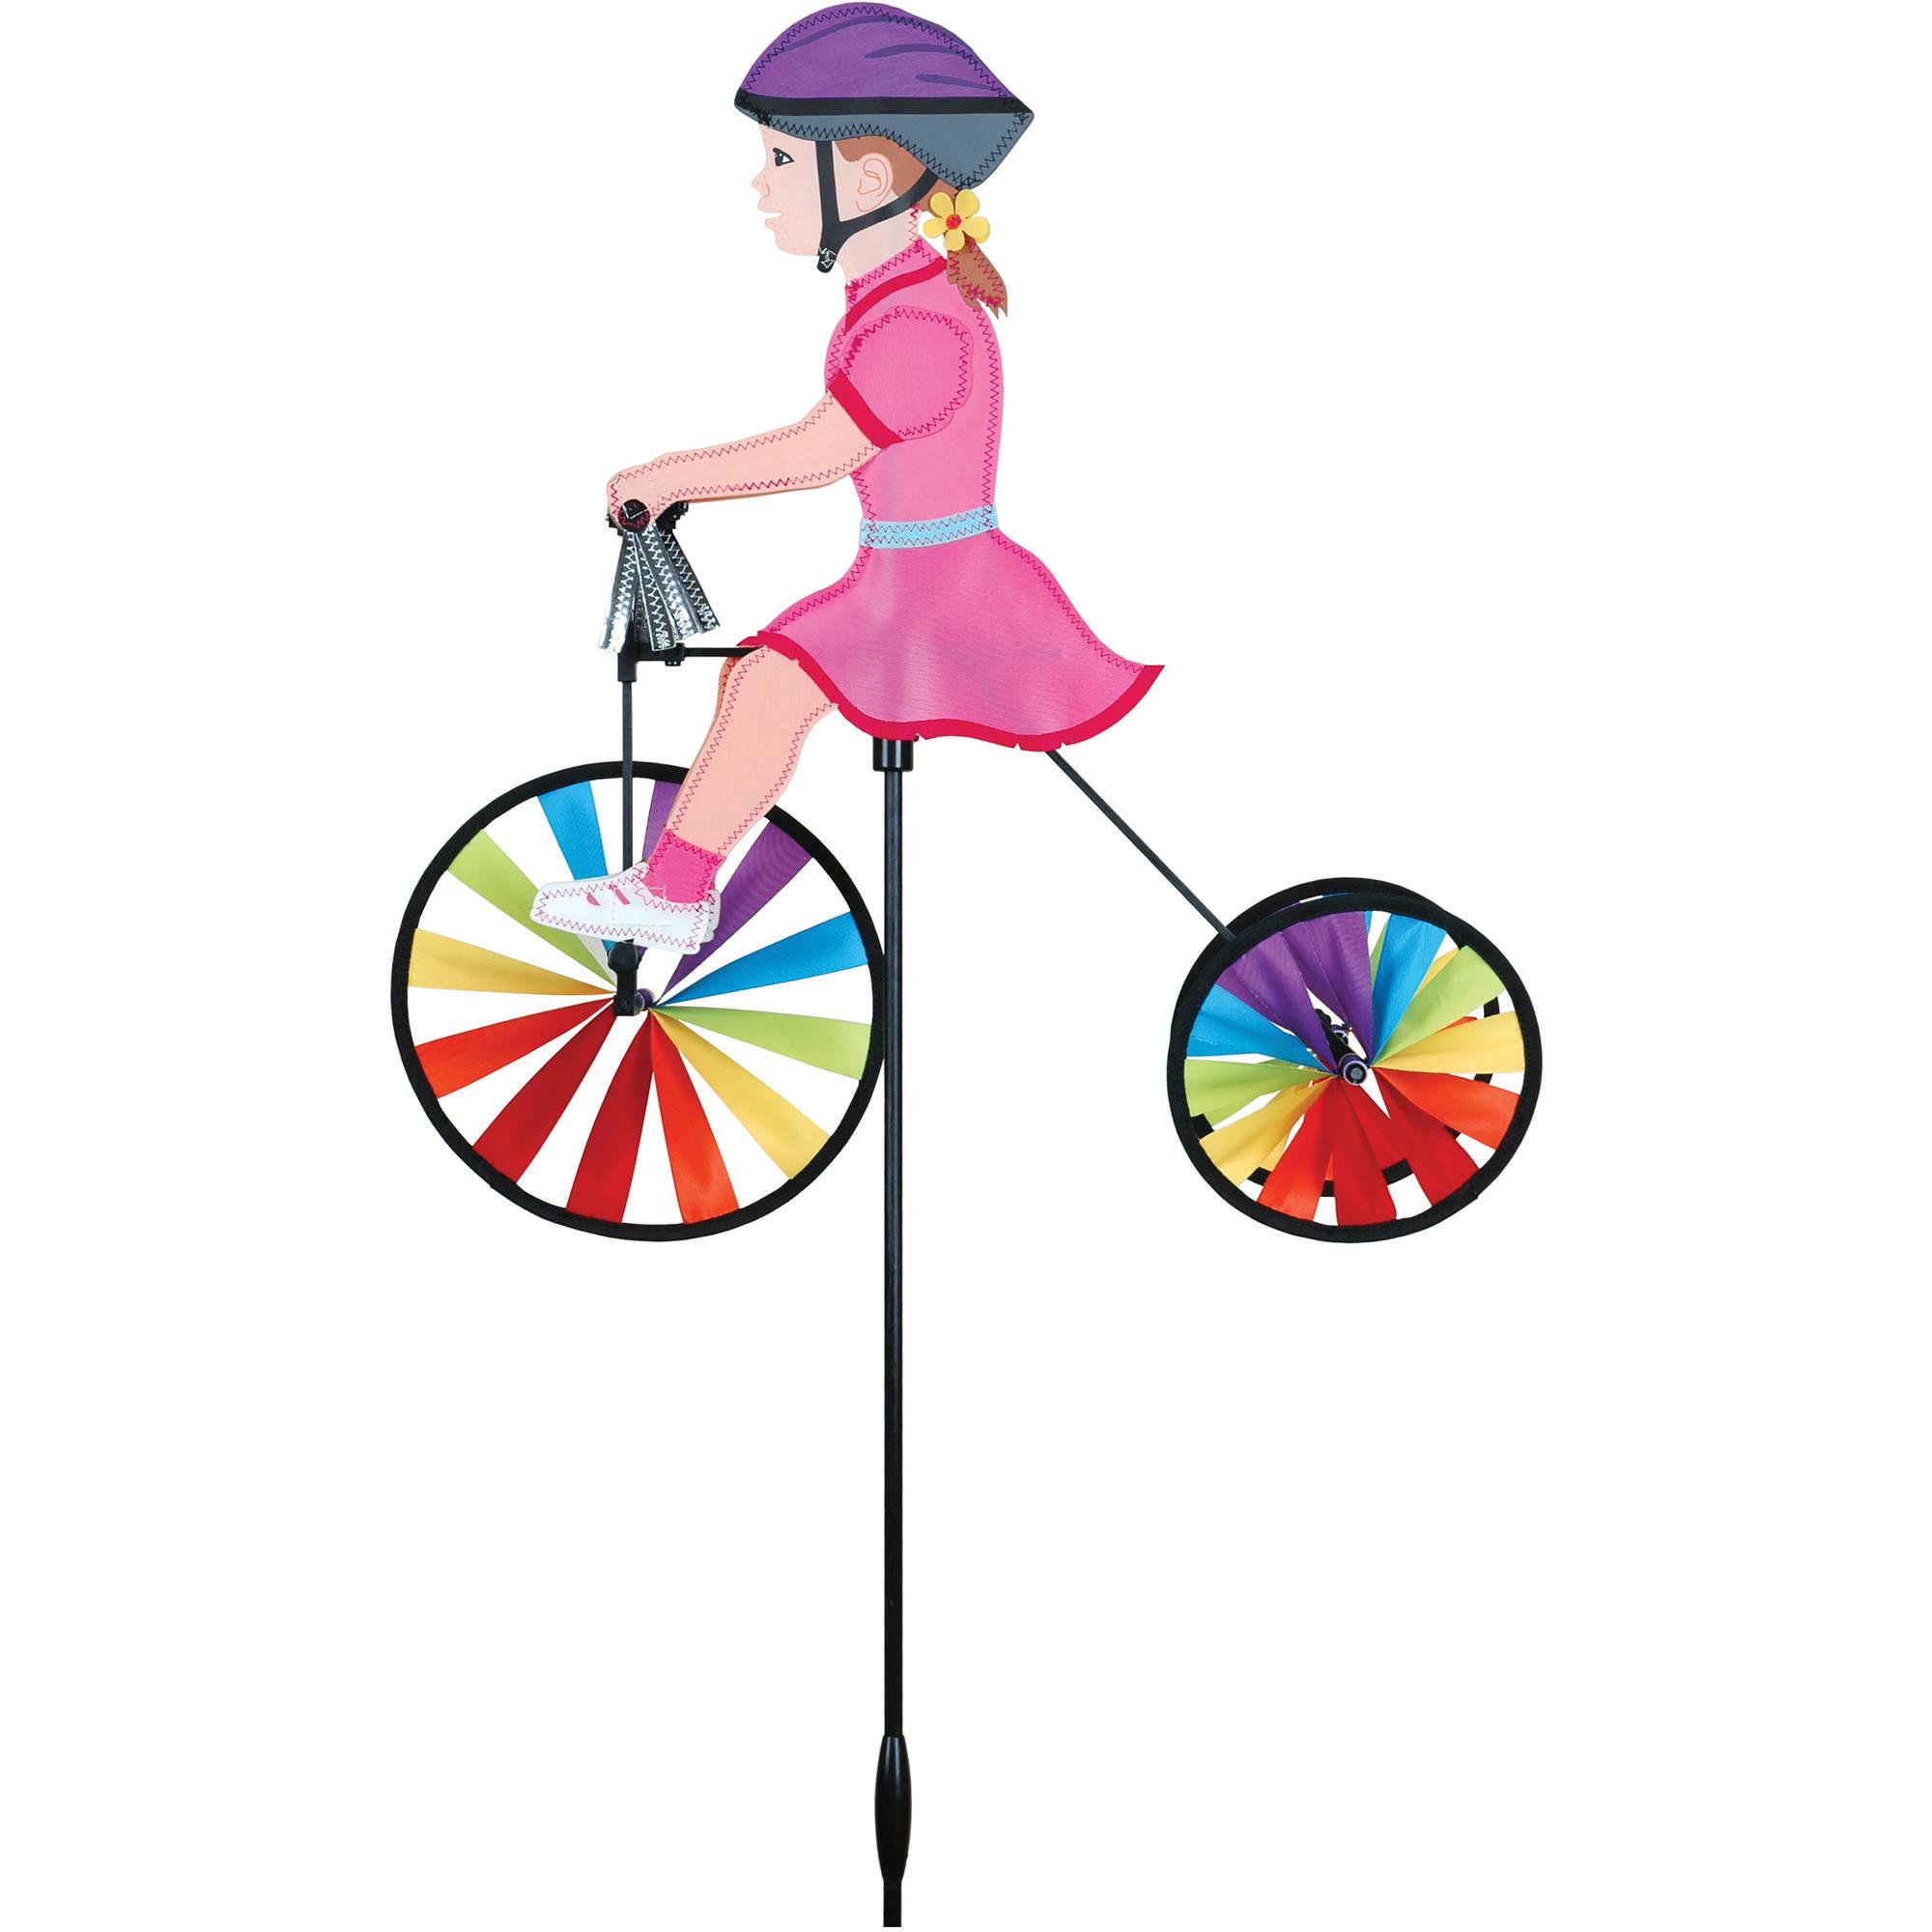 "Premier Designs 19"" Tricycle Spinner, Girl by Premier Kites"